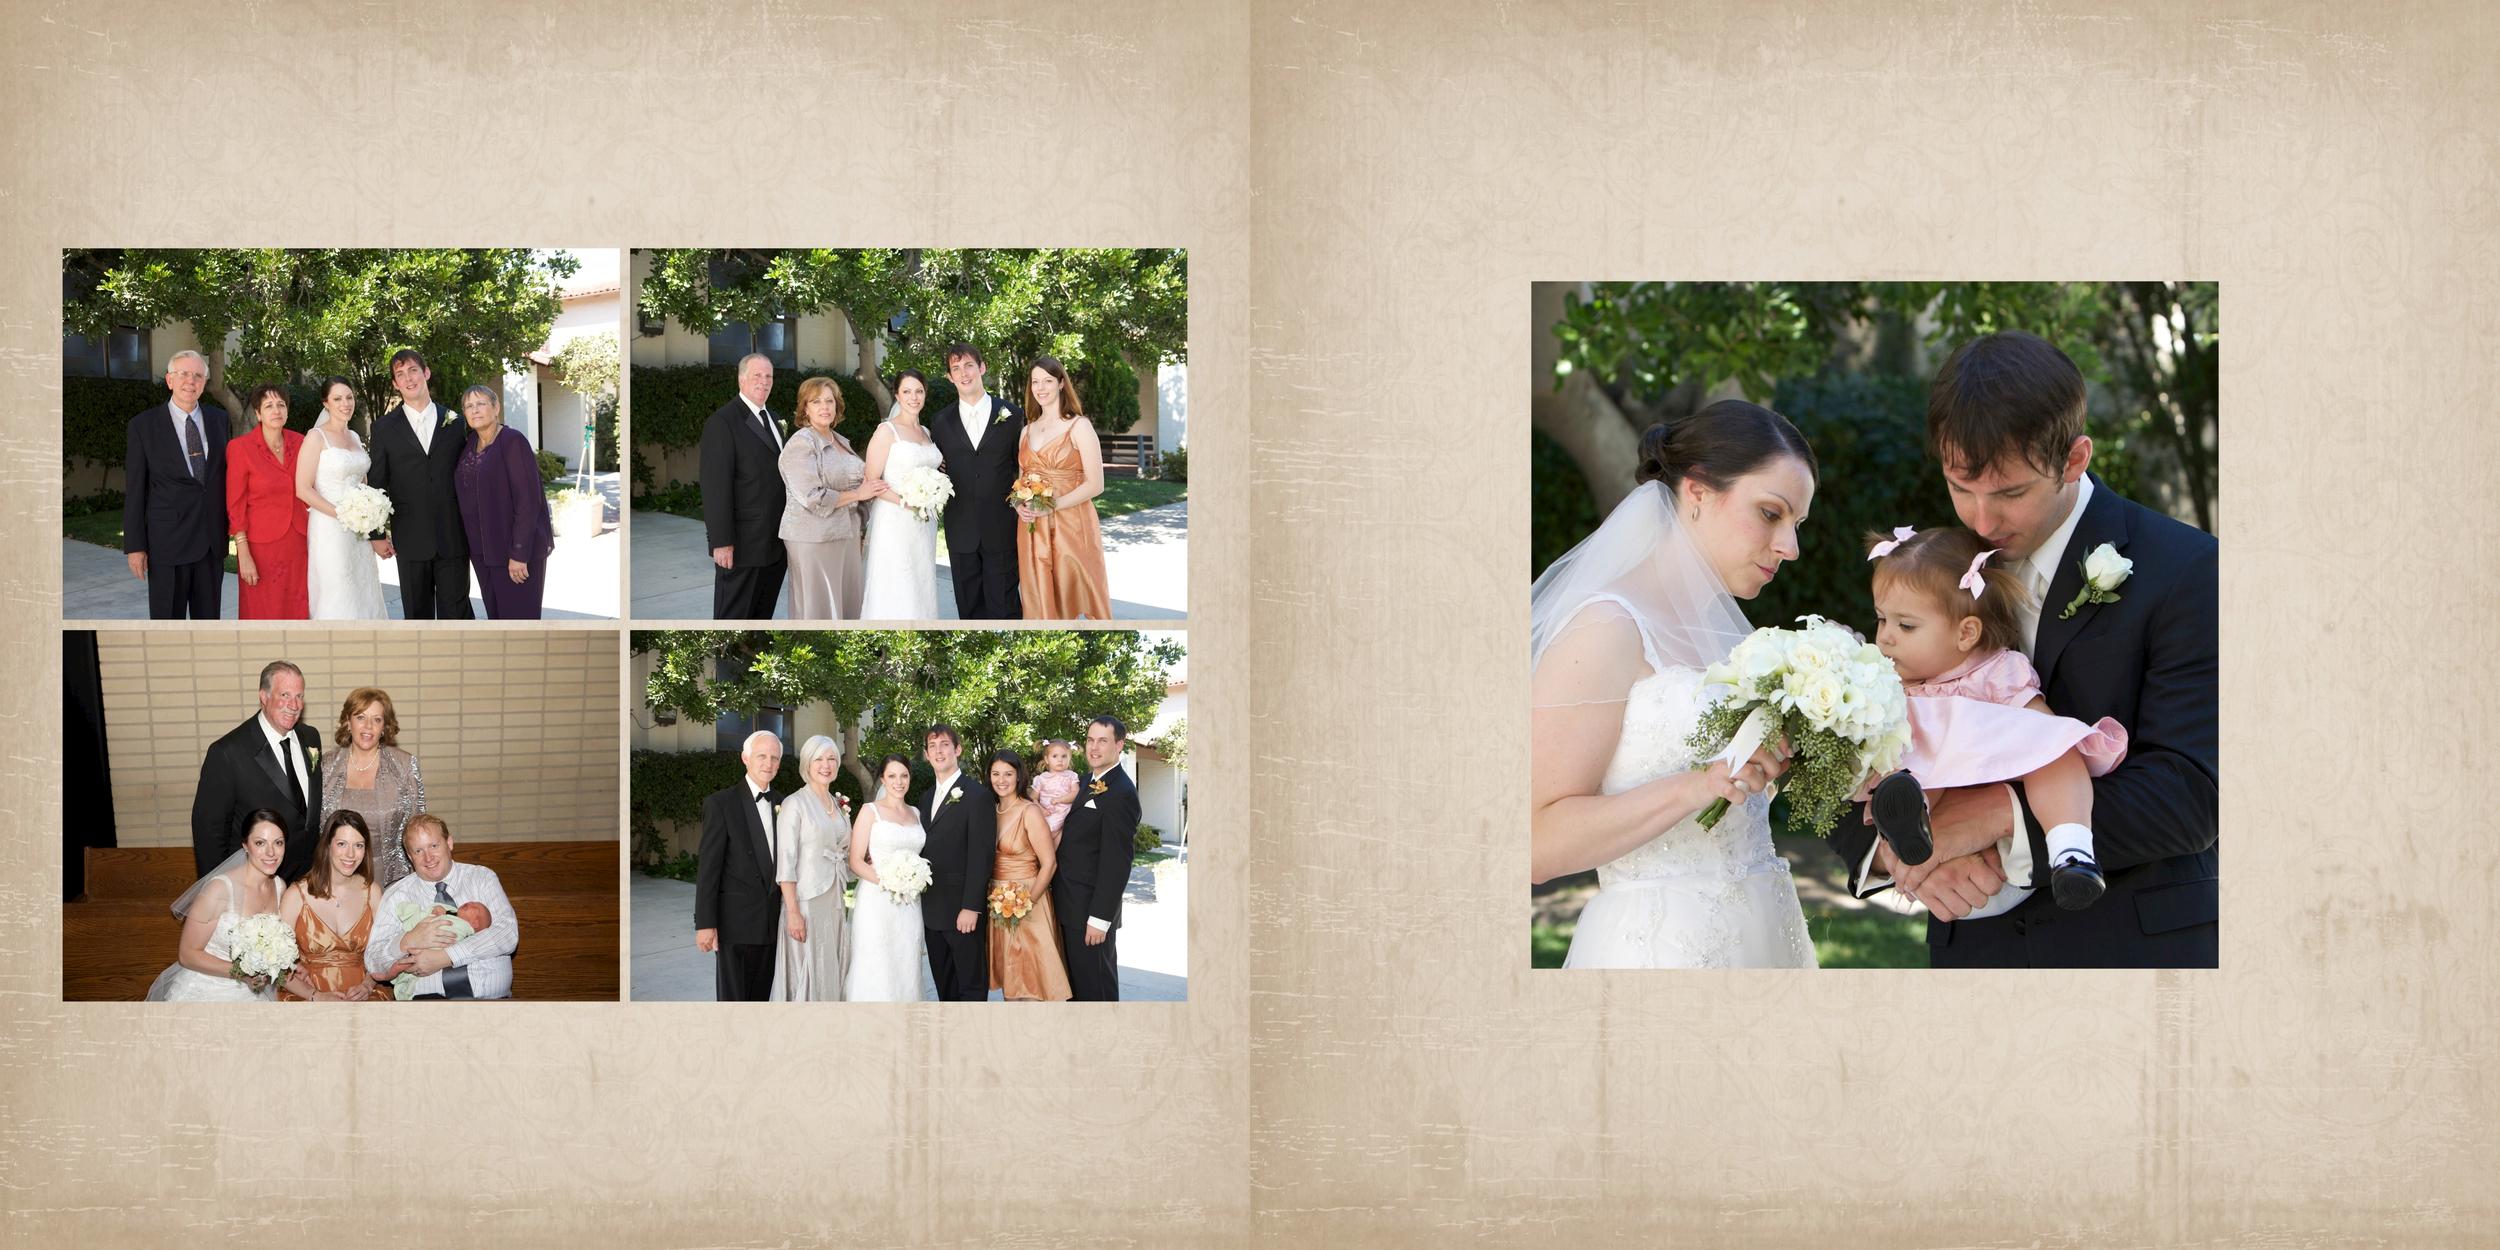 Page26-27.jpg